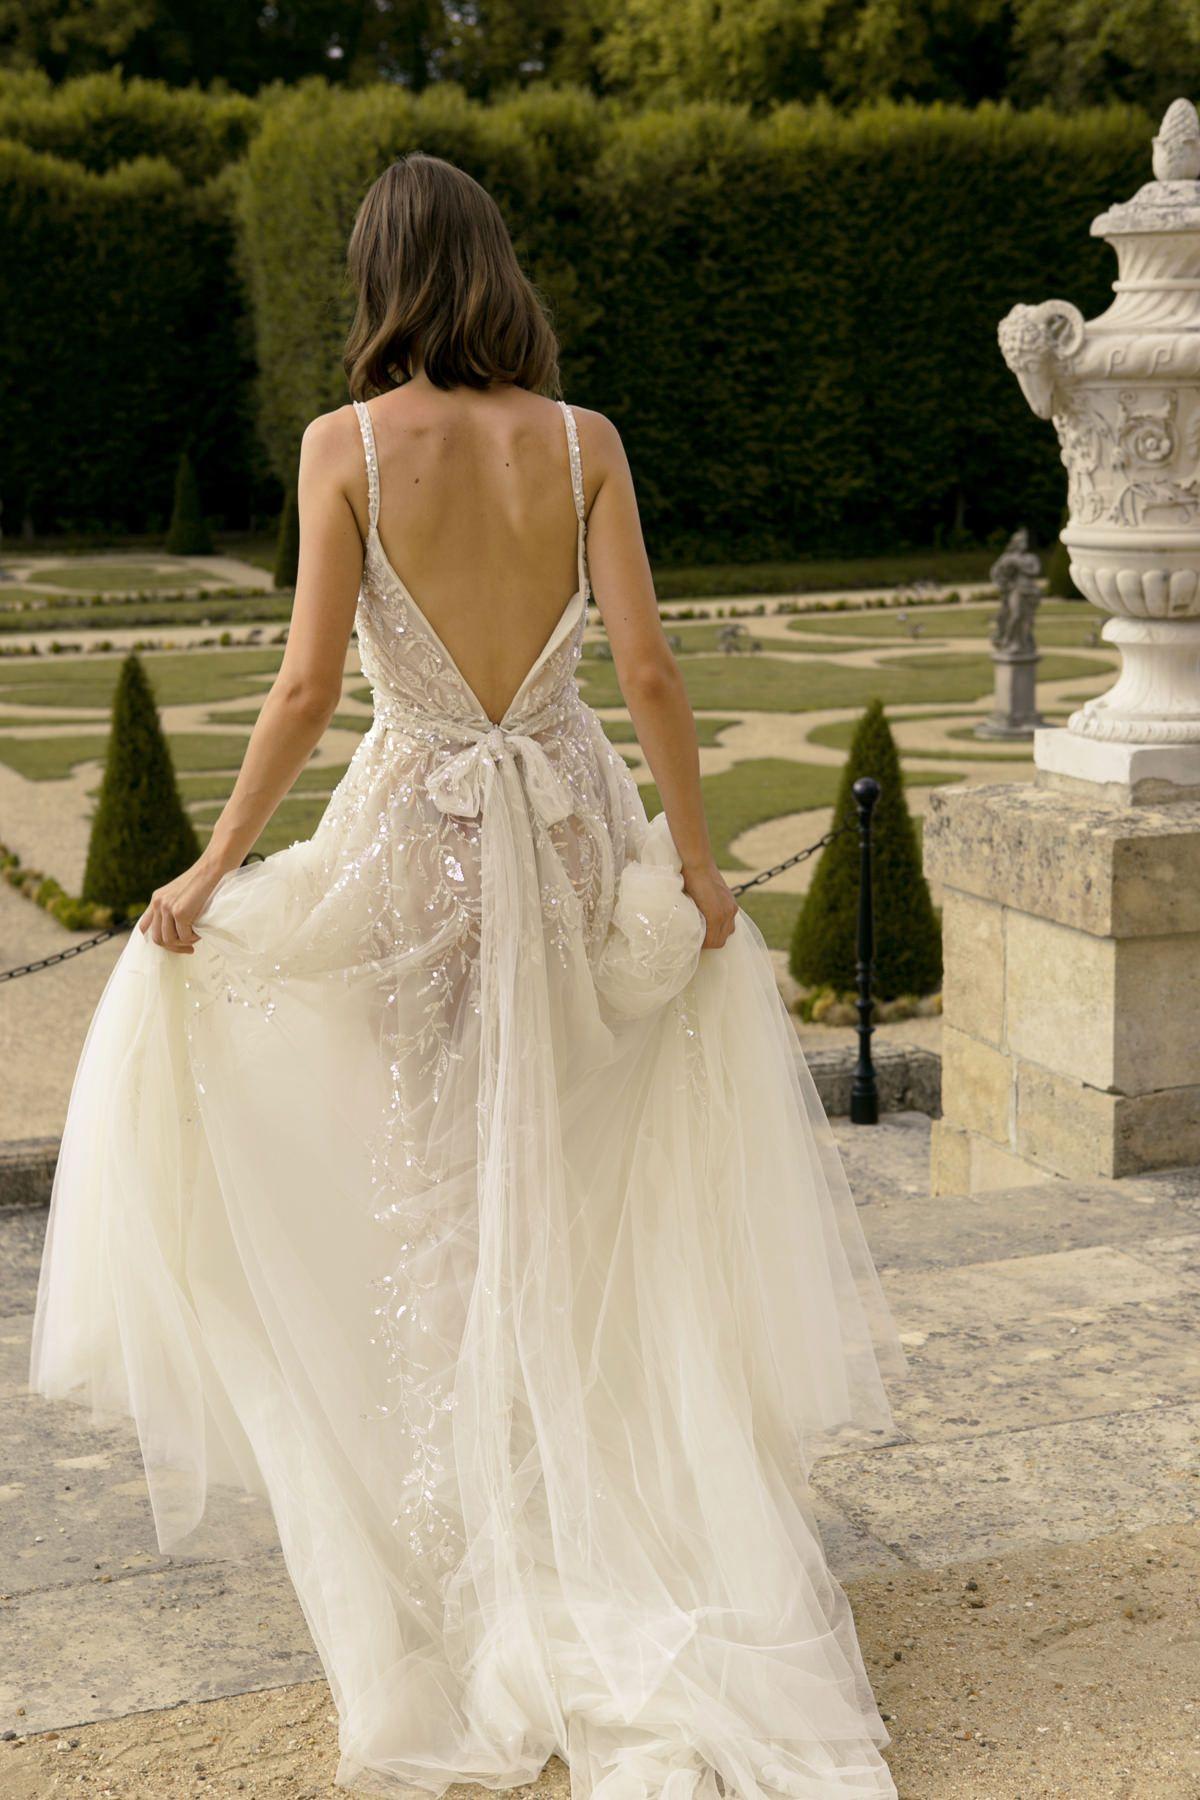 L&20;eto Bridal